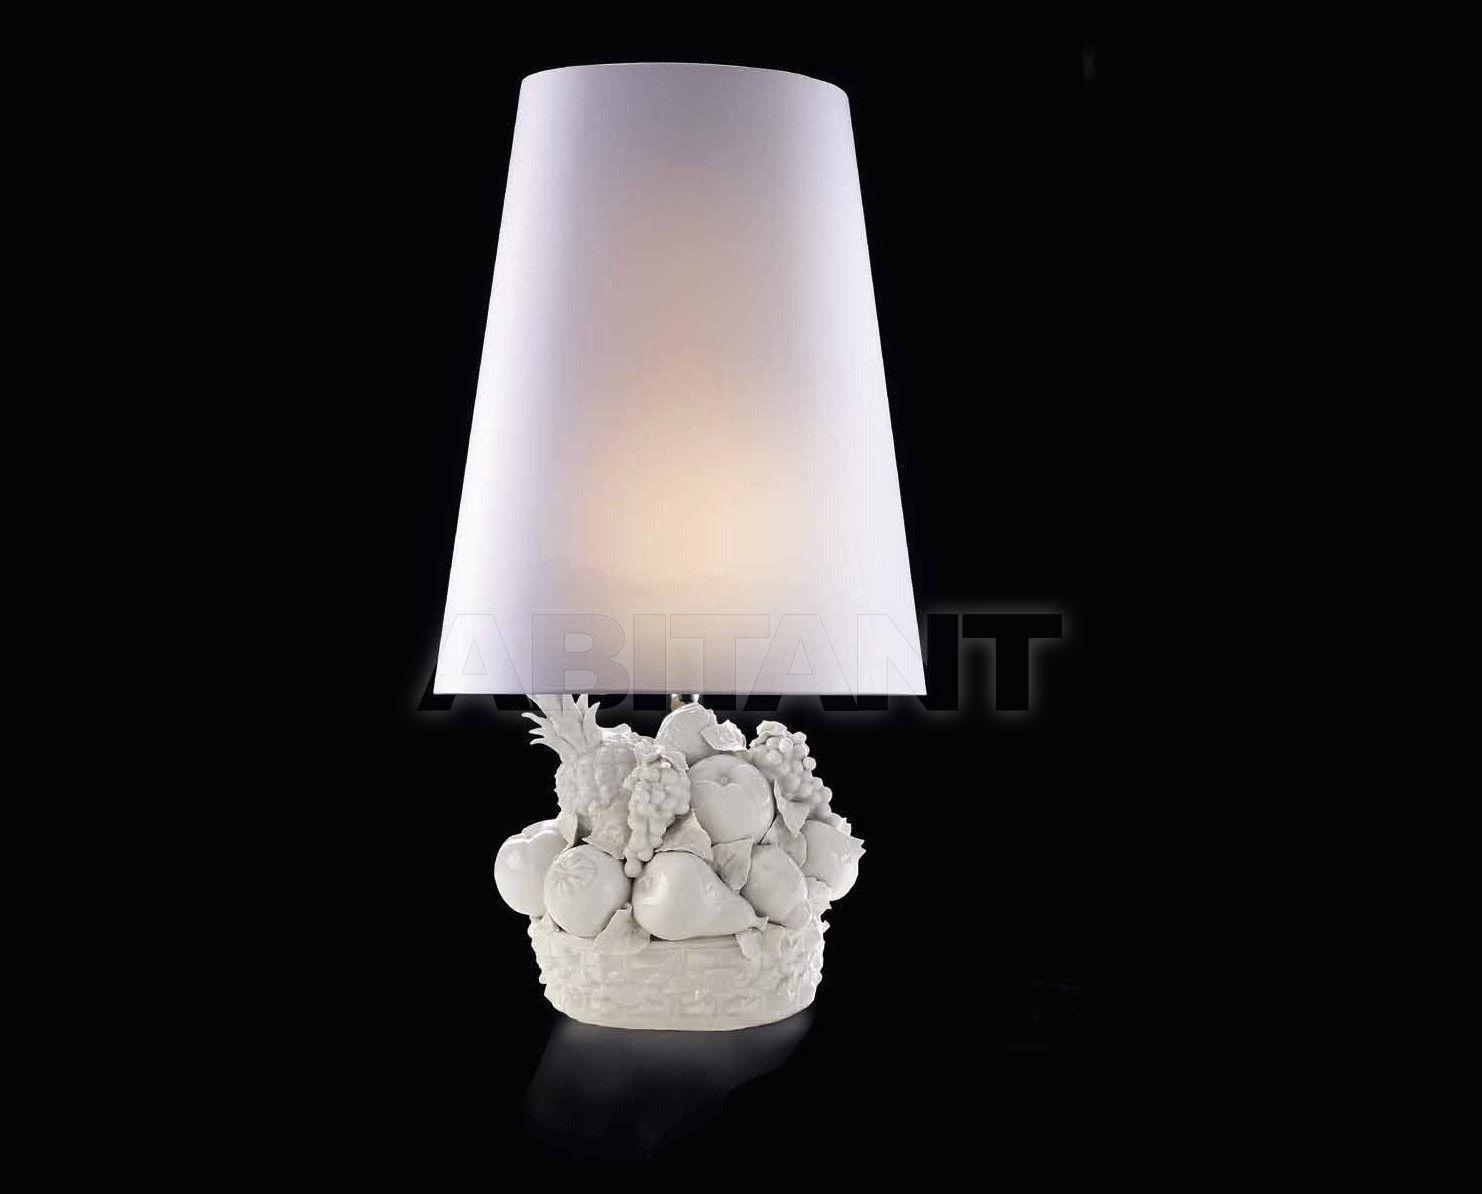 Купить Лампа настольная LAMPADA FRUTTA Villari Grande Opera Ii 0003850-102